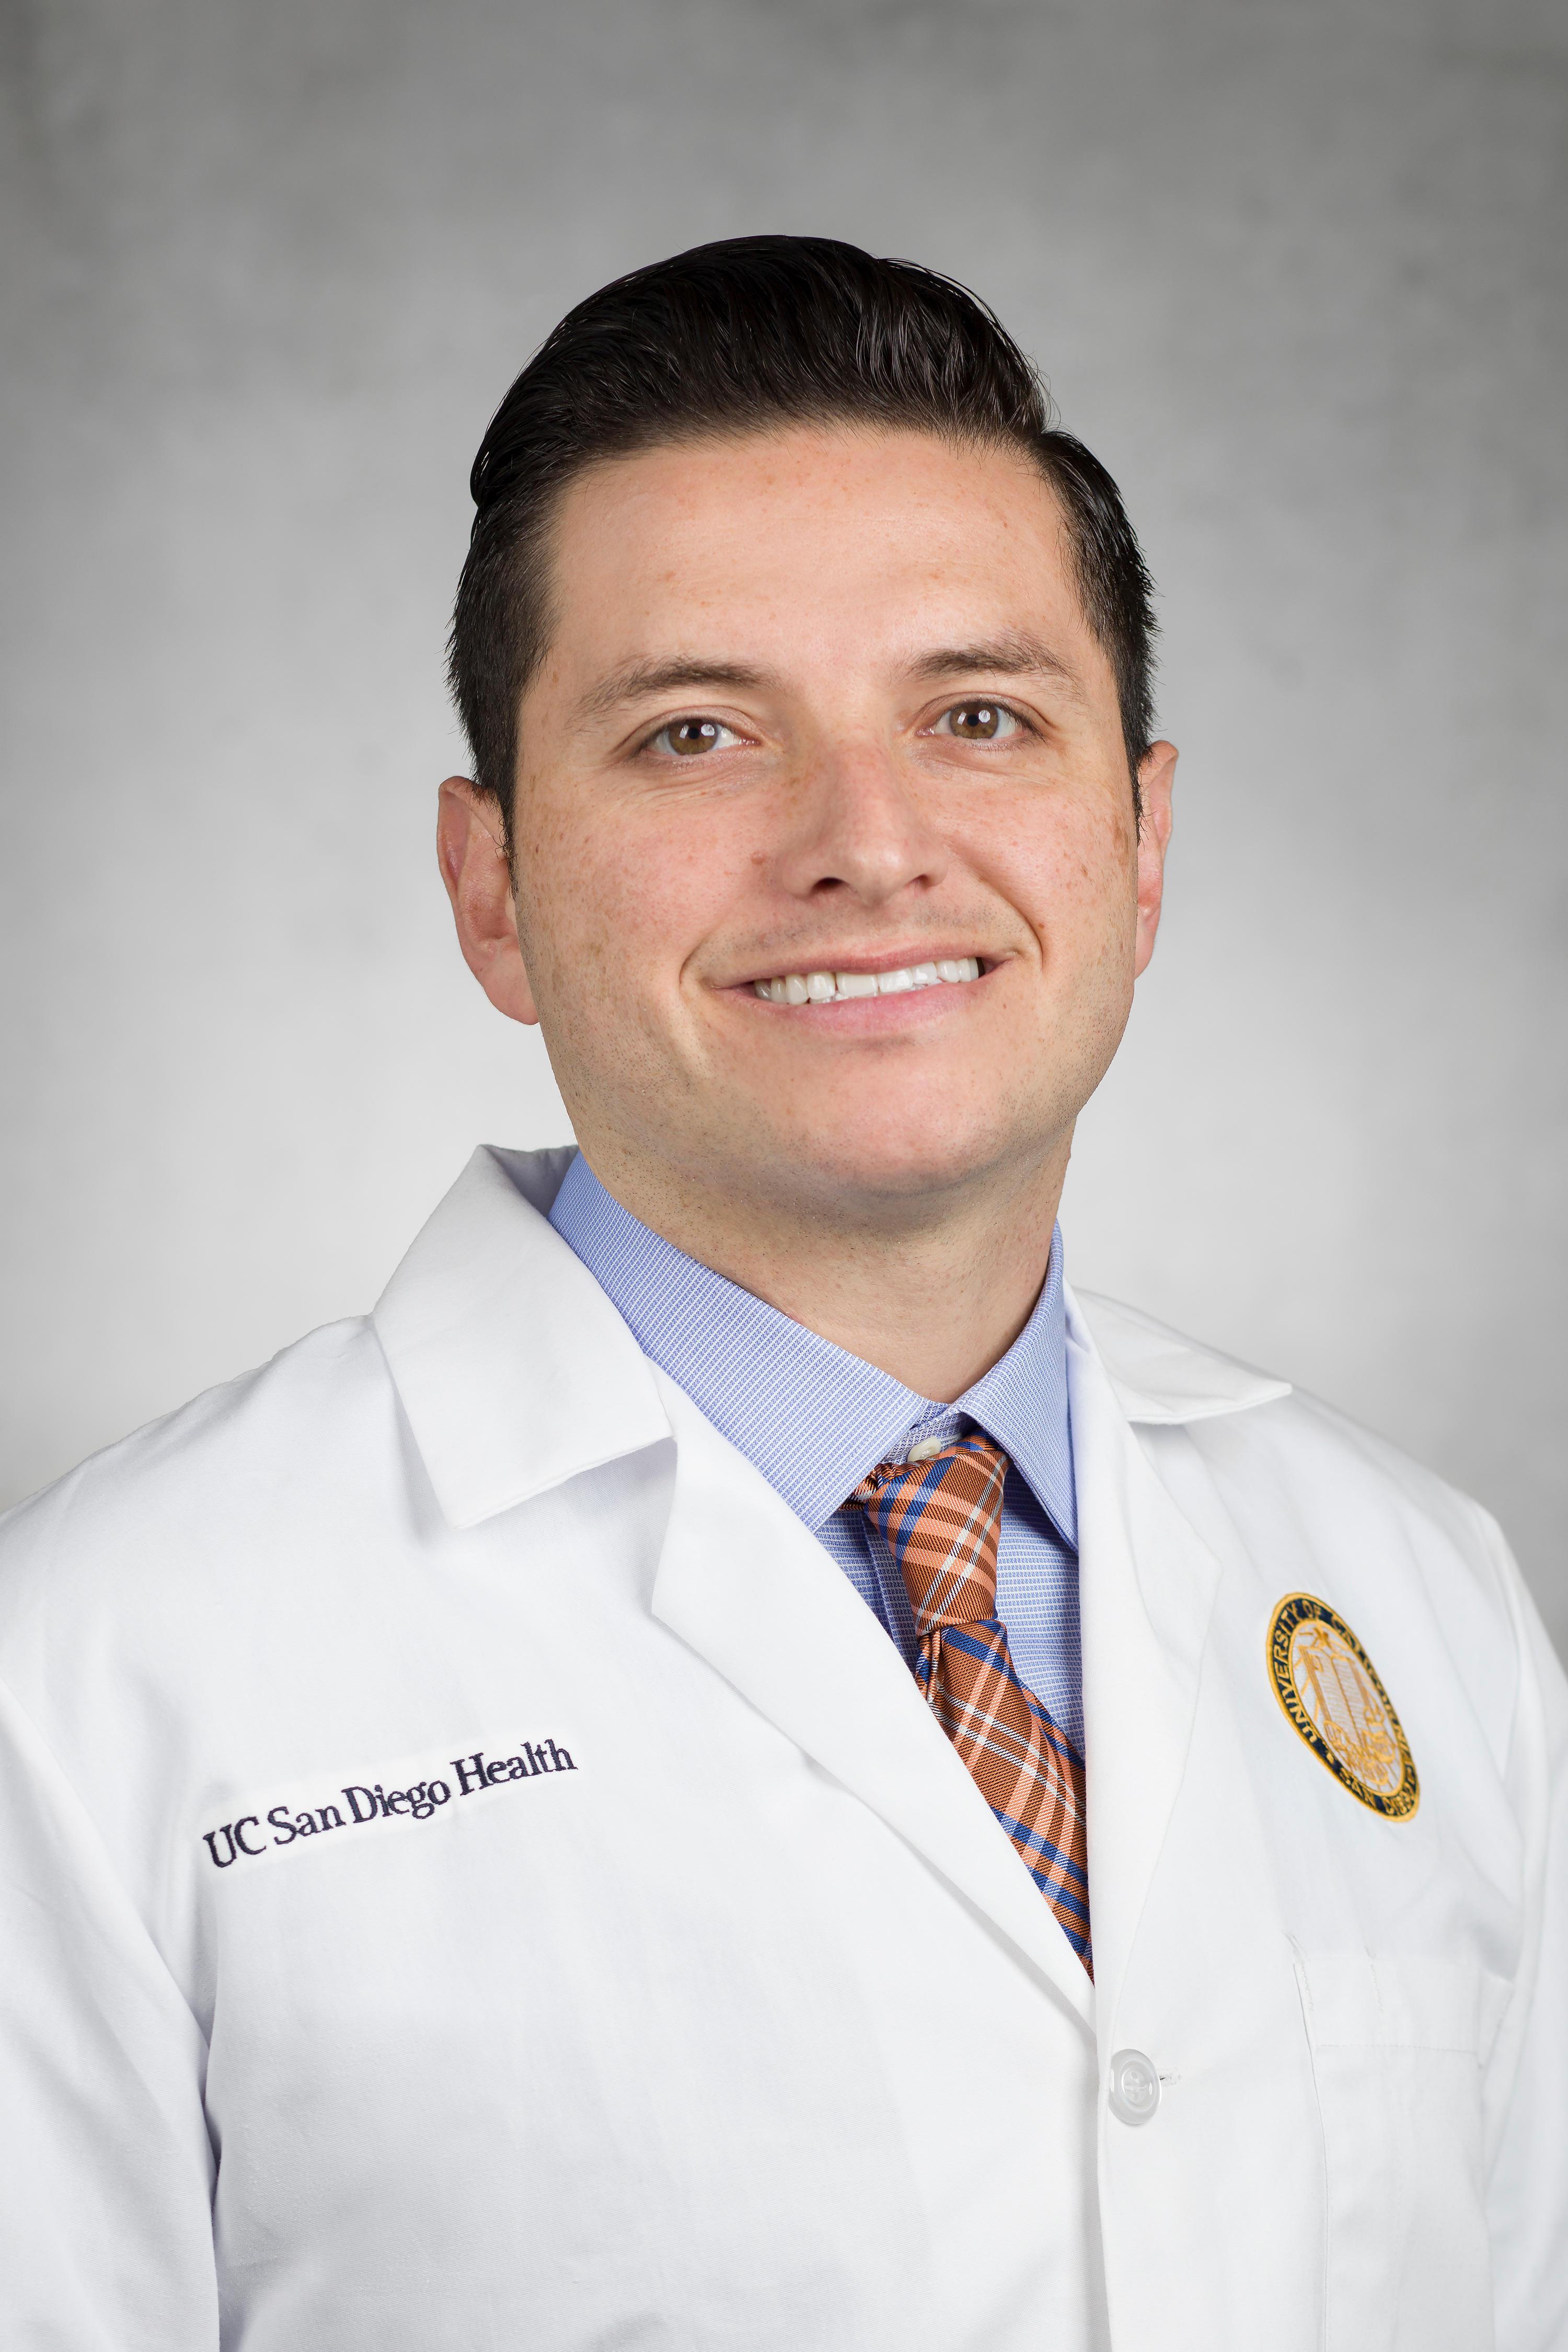 Marcus A. Urey, MD